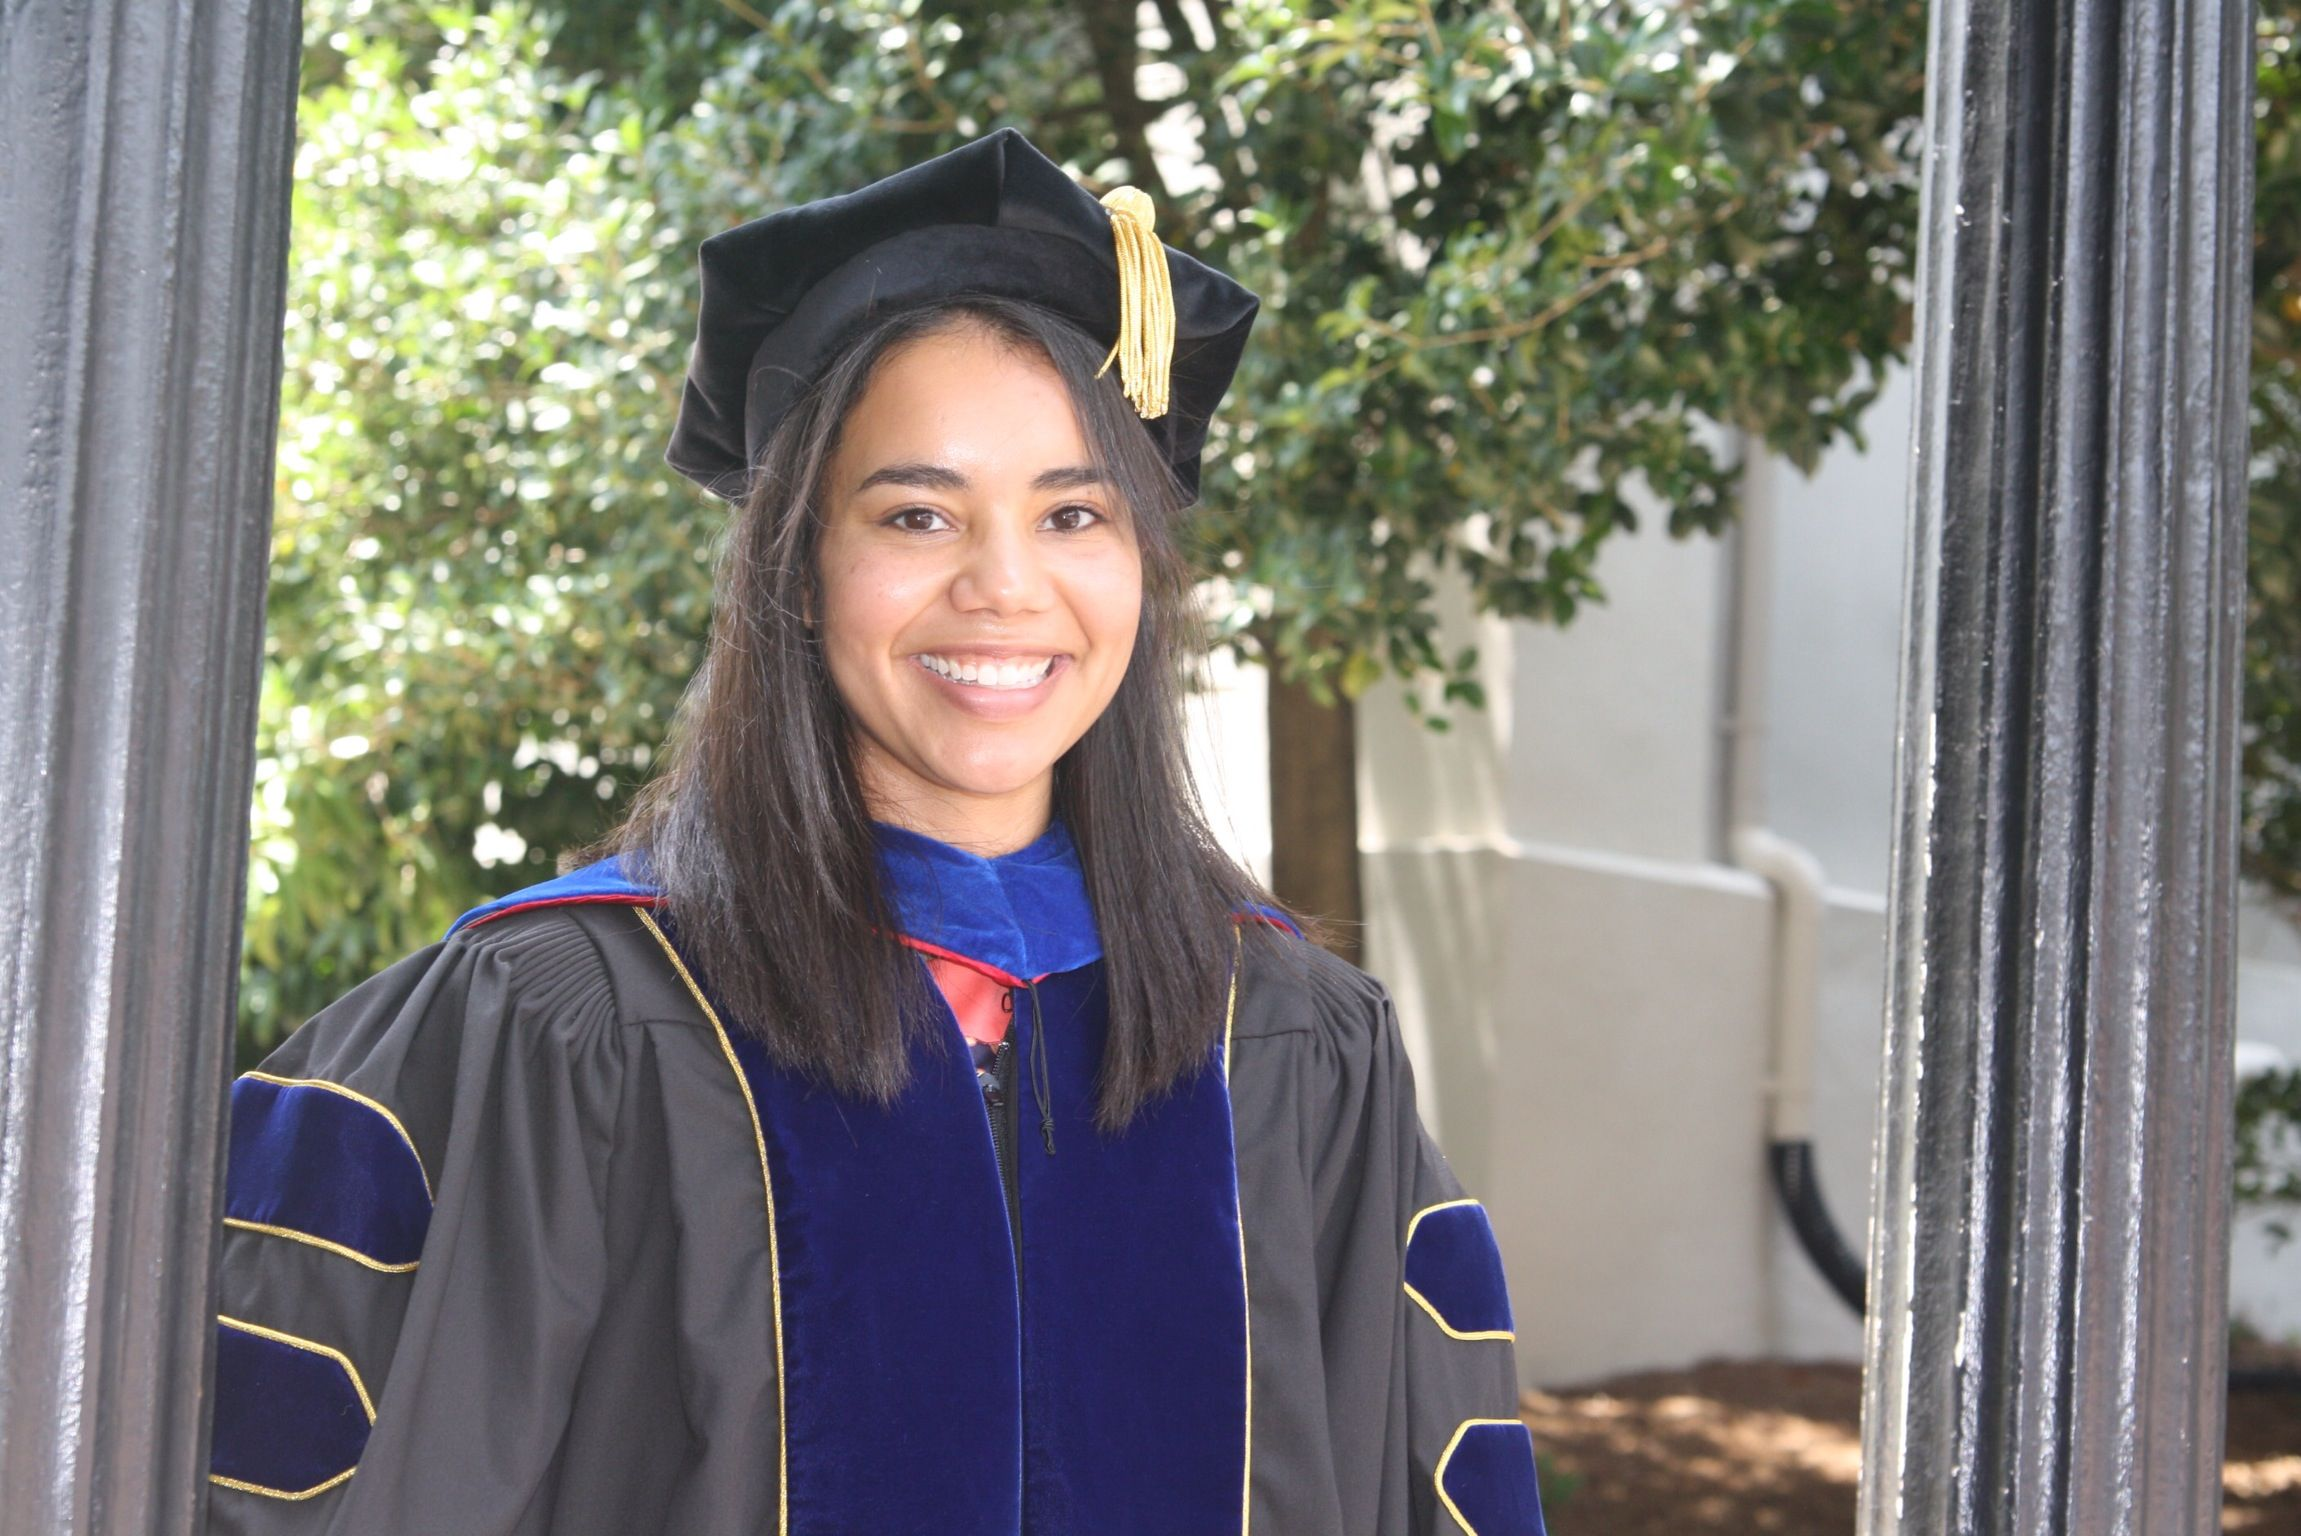 Dr. Emilia Noelle Bak